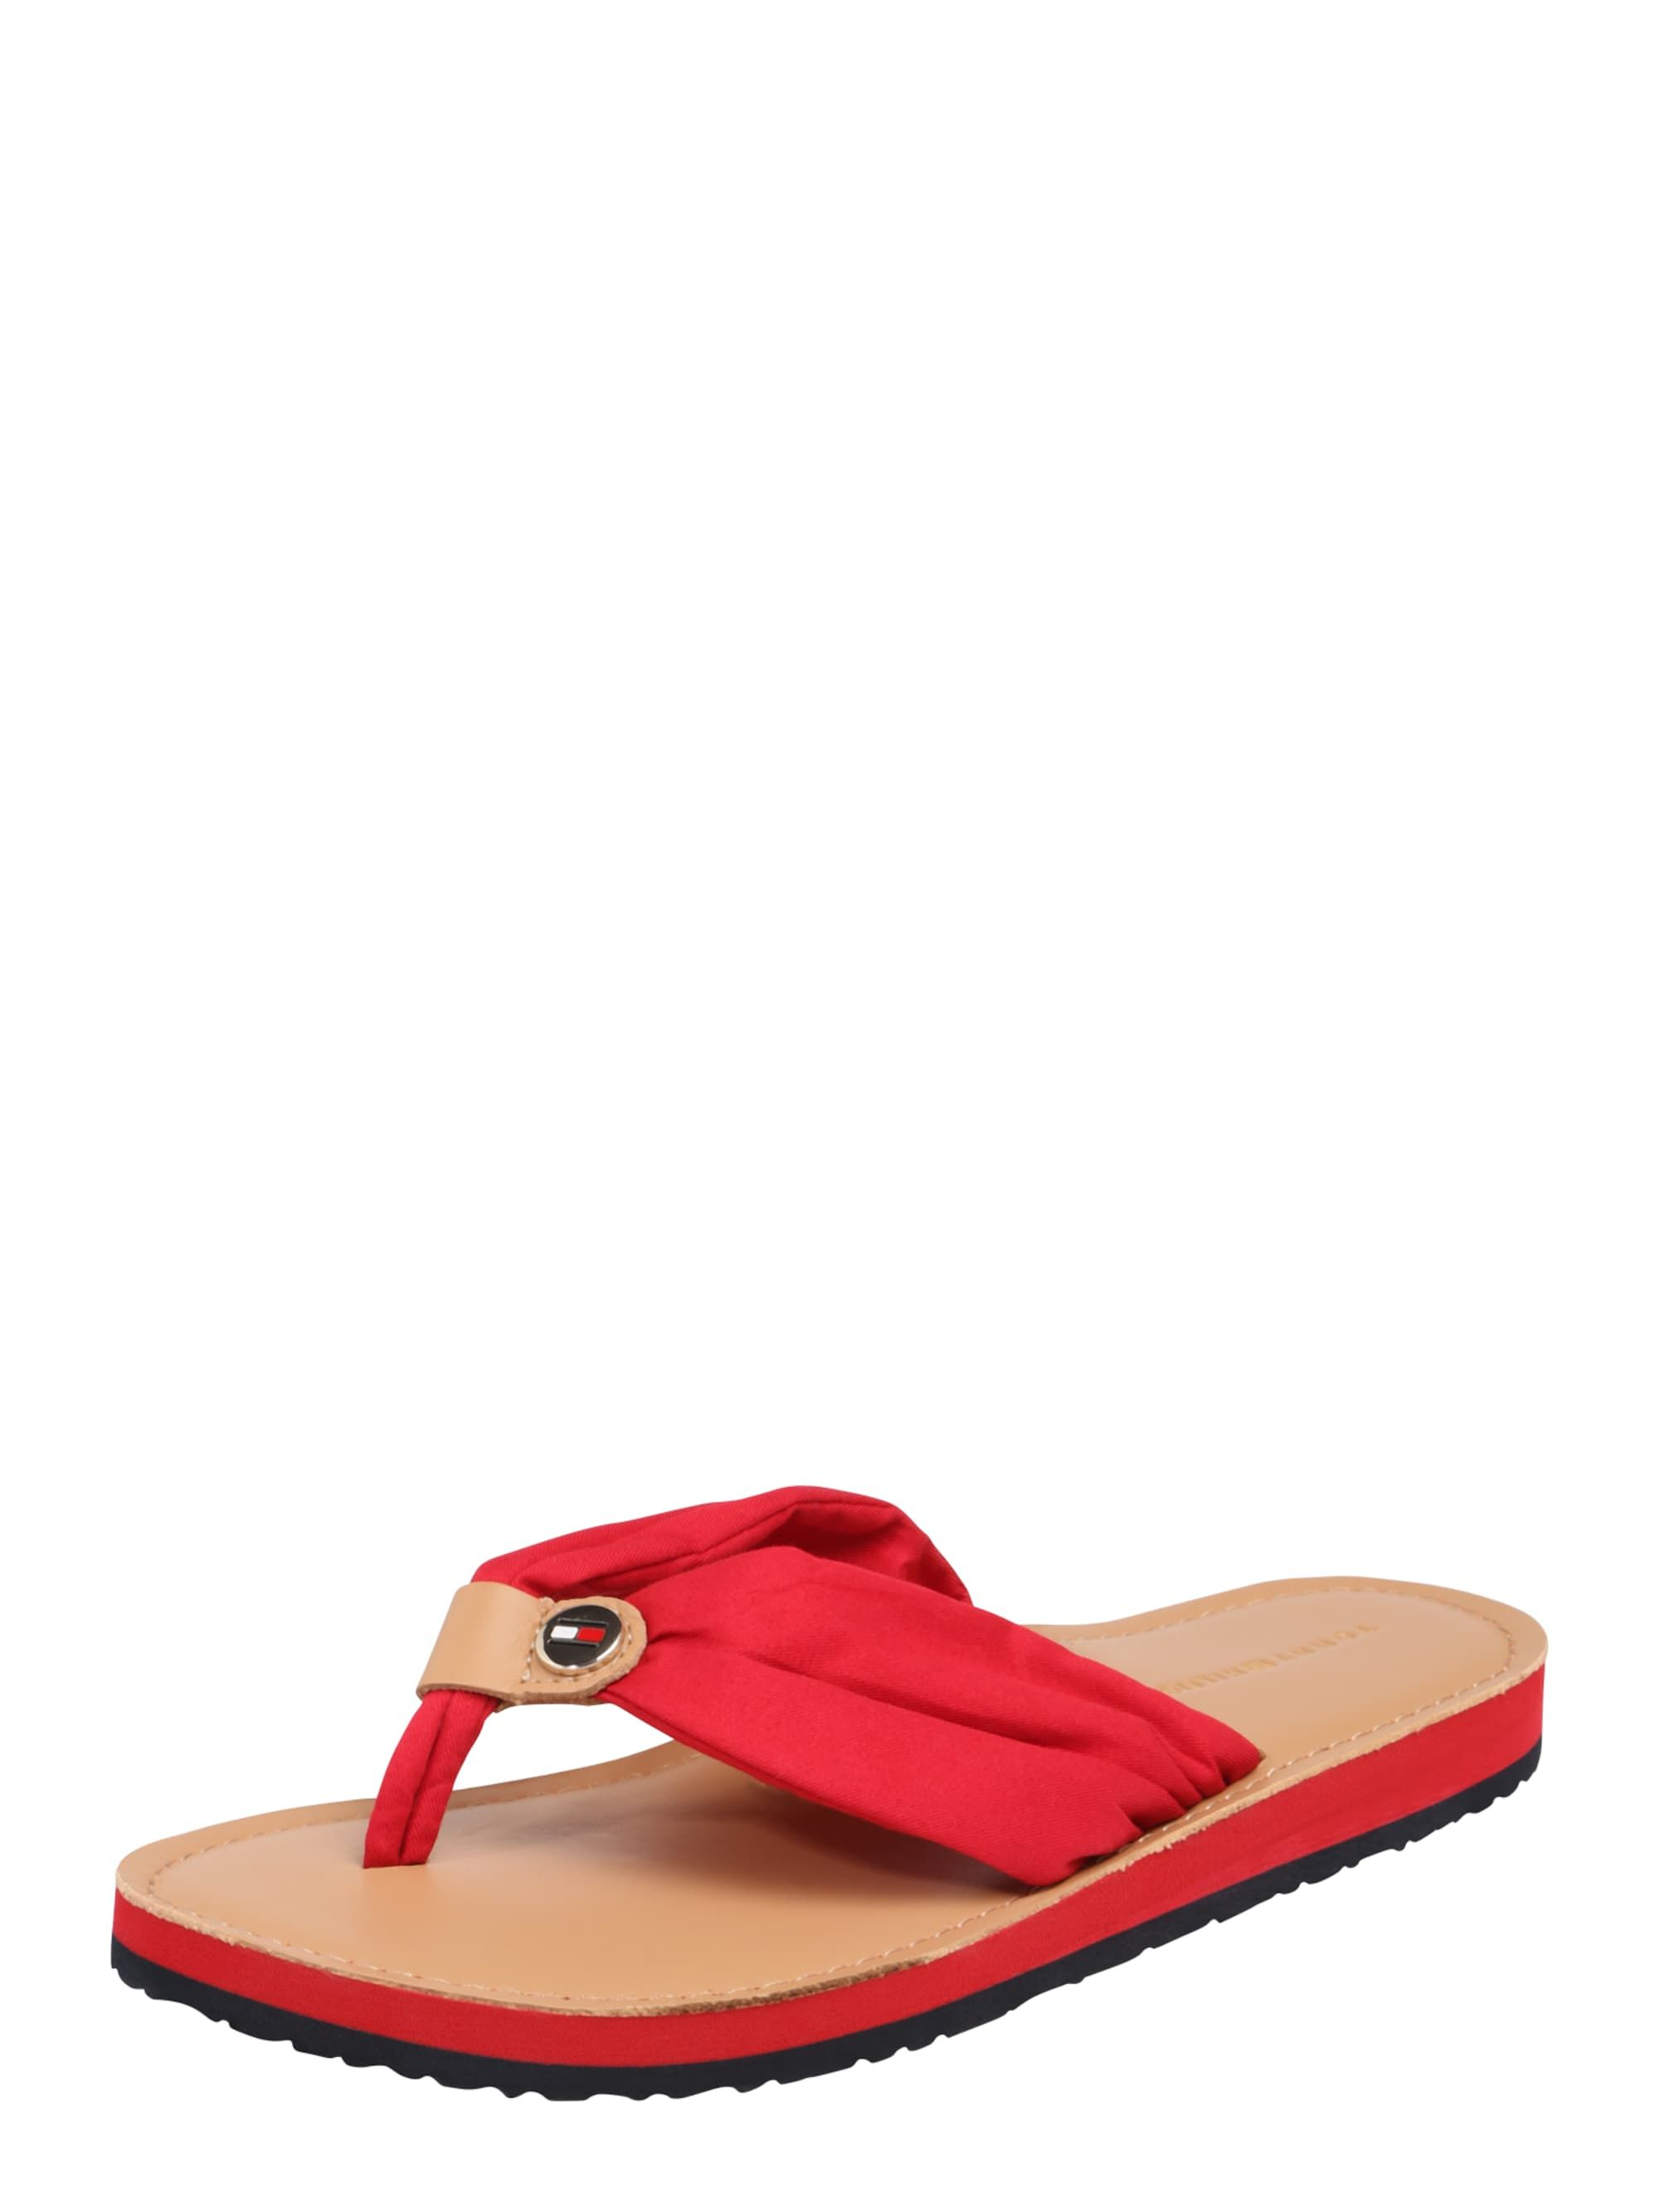 Damen Tommy Hilfiger Zehentrenner Mit Label Applikation Braun Rot Kategorie Damen Sandalenschuhezehentre Mens Flip Flop Birkenstock Gizeh Shoes